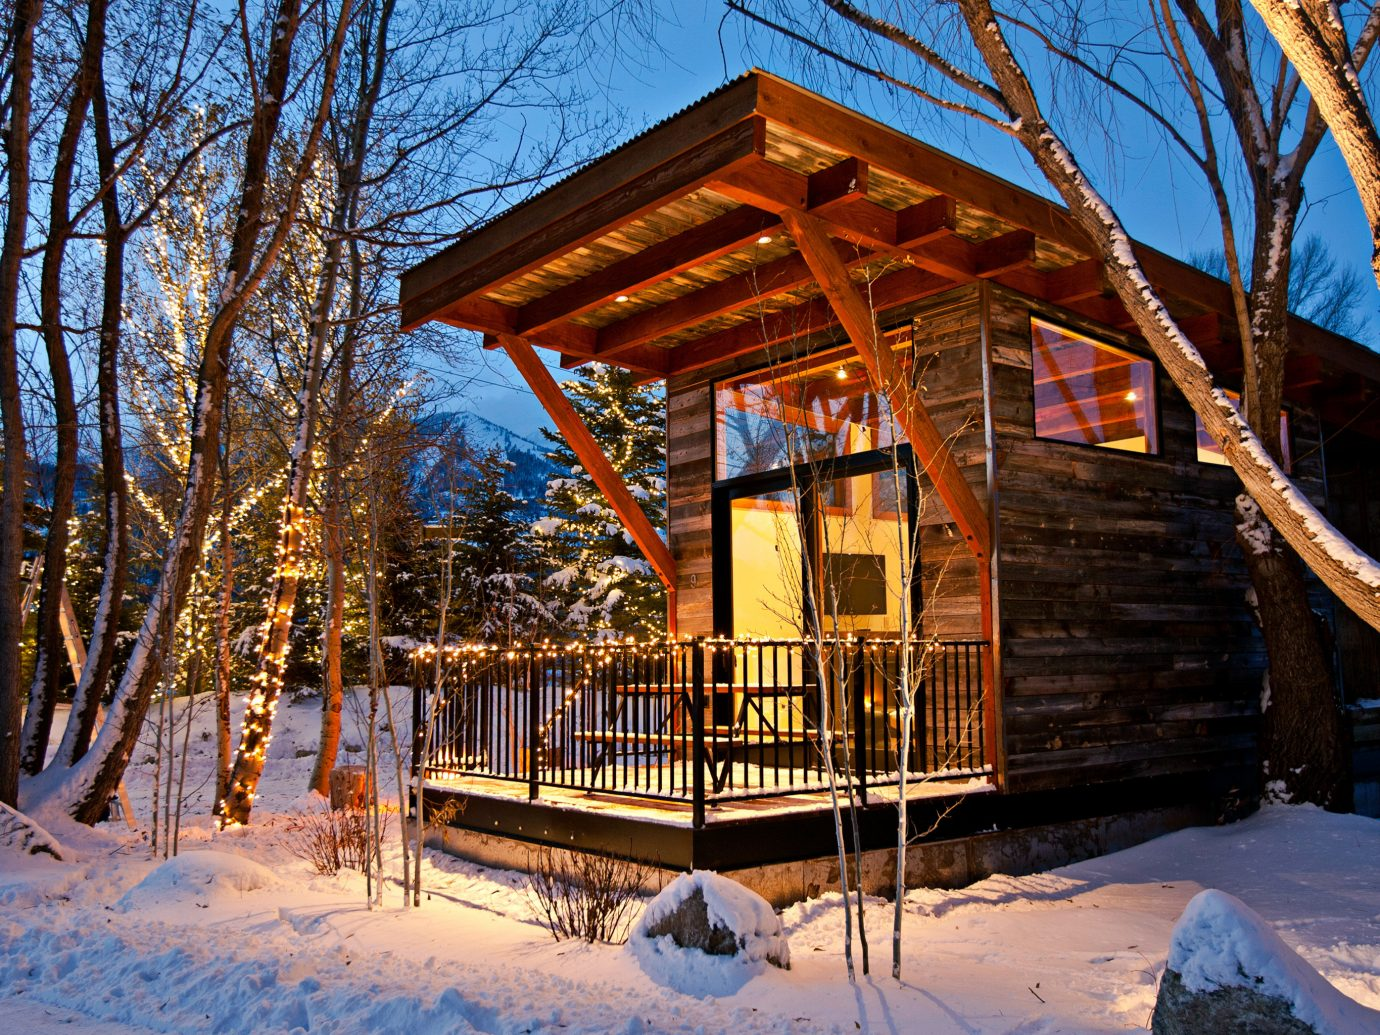 Country Glamping Hotels Trip Ideas tree snow Winter season log cabin house Resort shrine